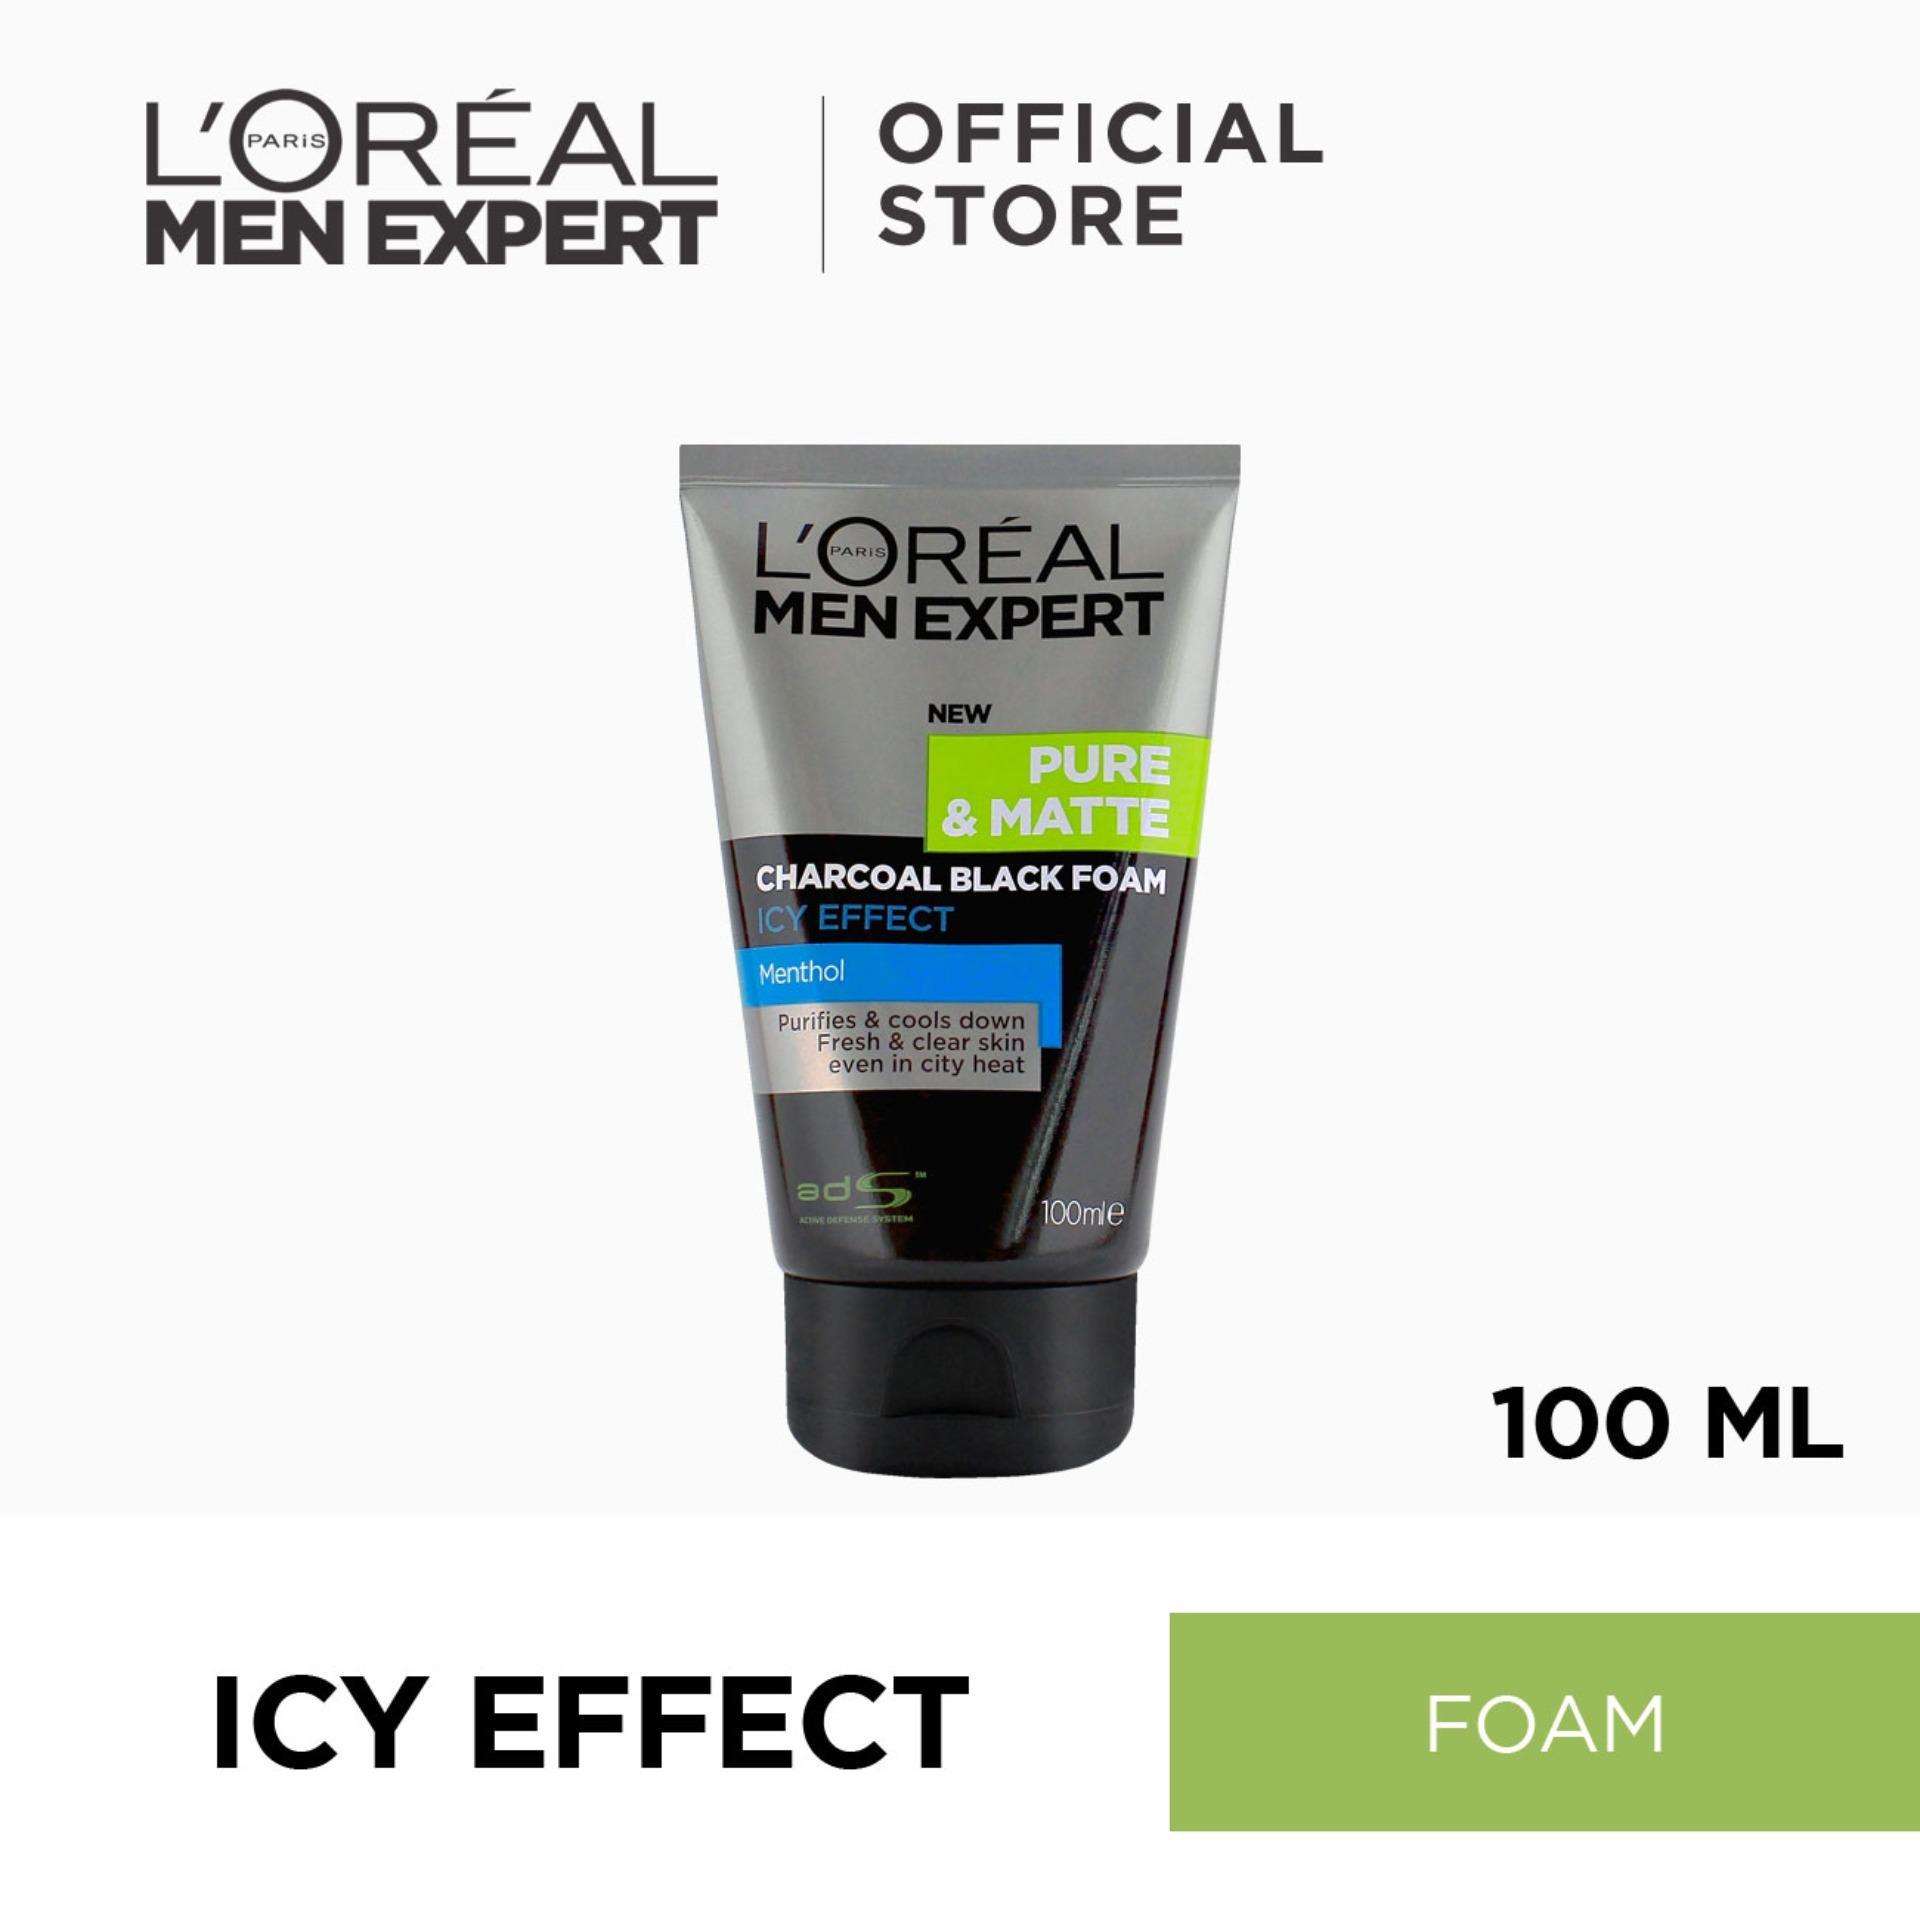 Face Cleanser Brands Wash On Sale Prices Set Reviews In Loreal Men Expert White Foam Paris Pure Matte Charcoal Black 100ml